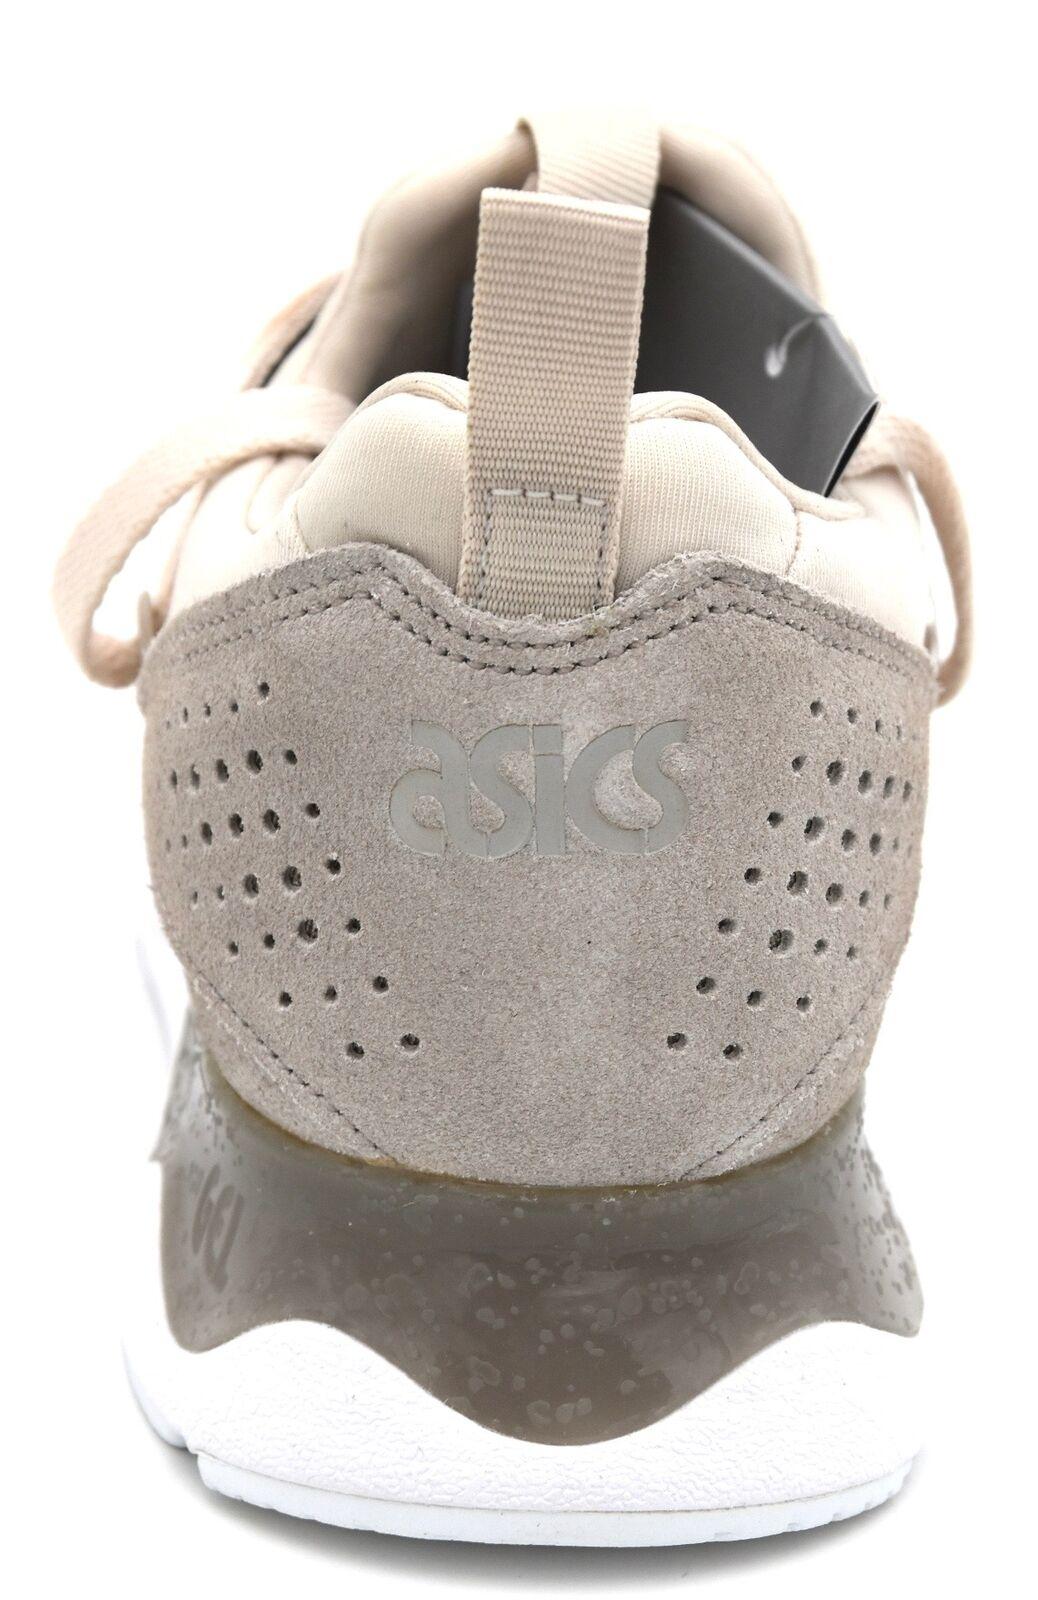 ASICS UOMO DONNA UNISEX SCARPA SCARPA SCARPA scarpe da ginnastica CASUAL ART. H817L GEL-LYTE V SANZE 9e6cef